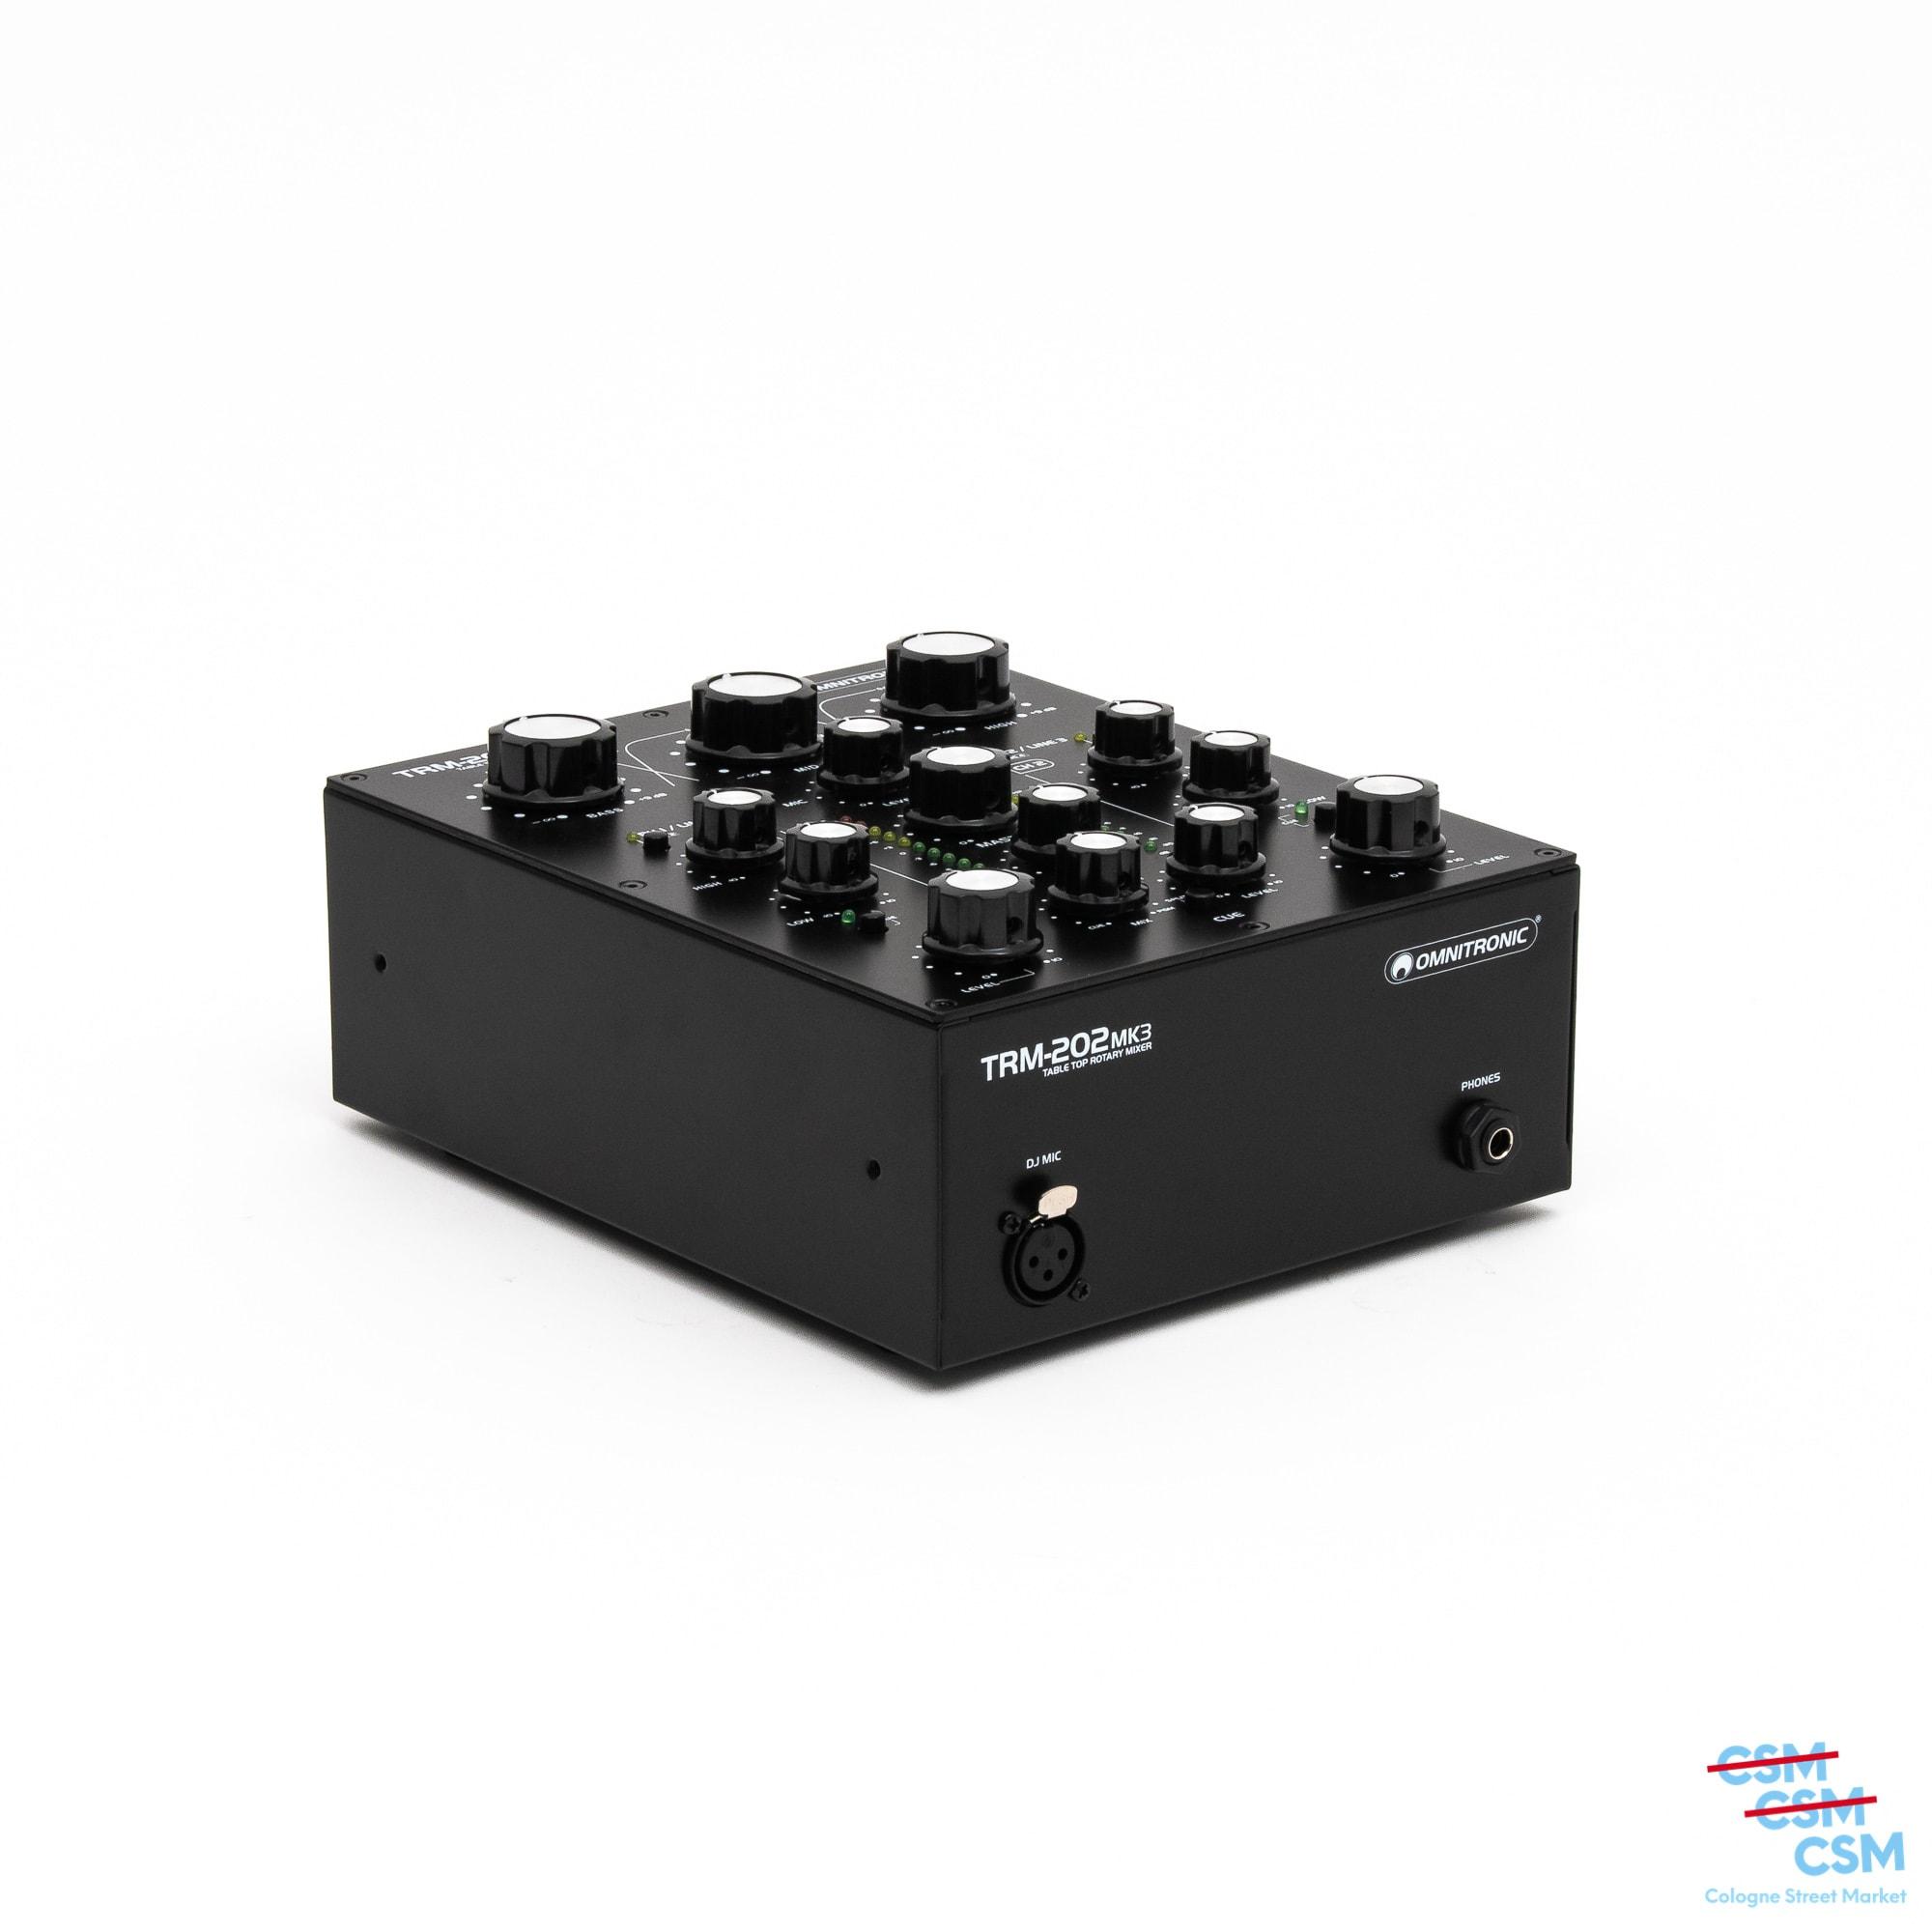 Omnitronic-TRM-202-MK3-neu-kaufen